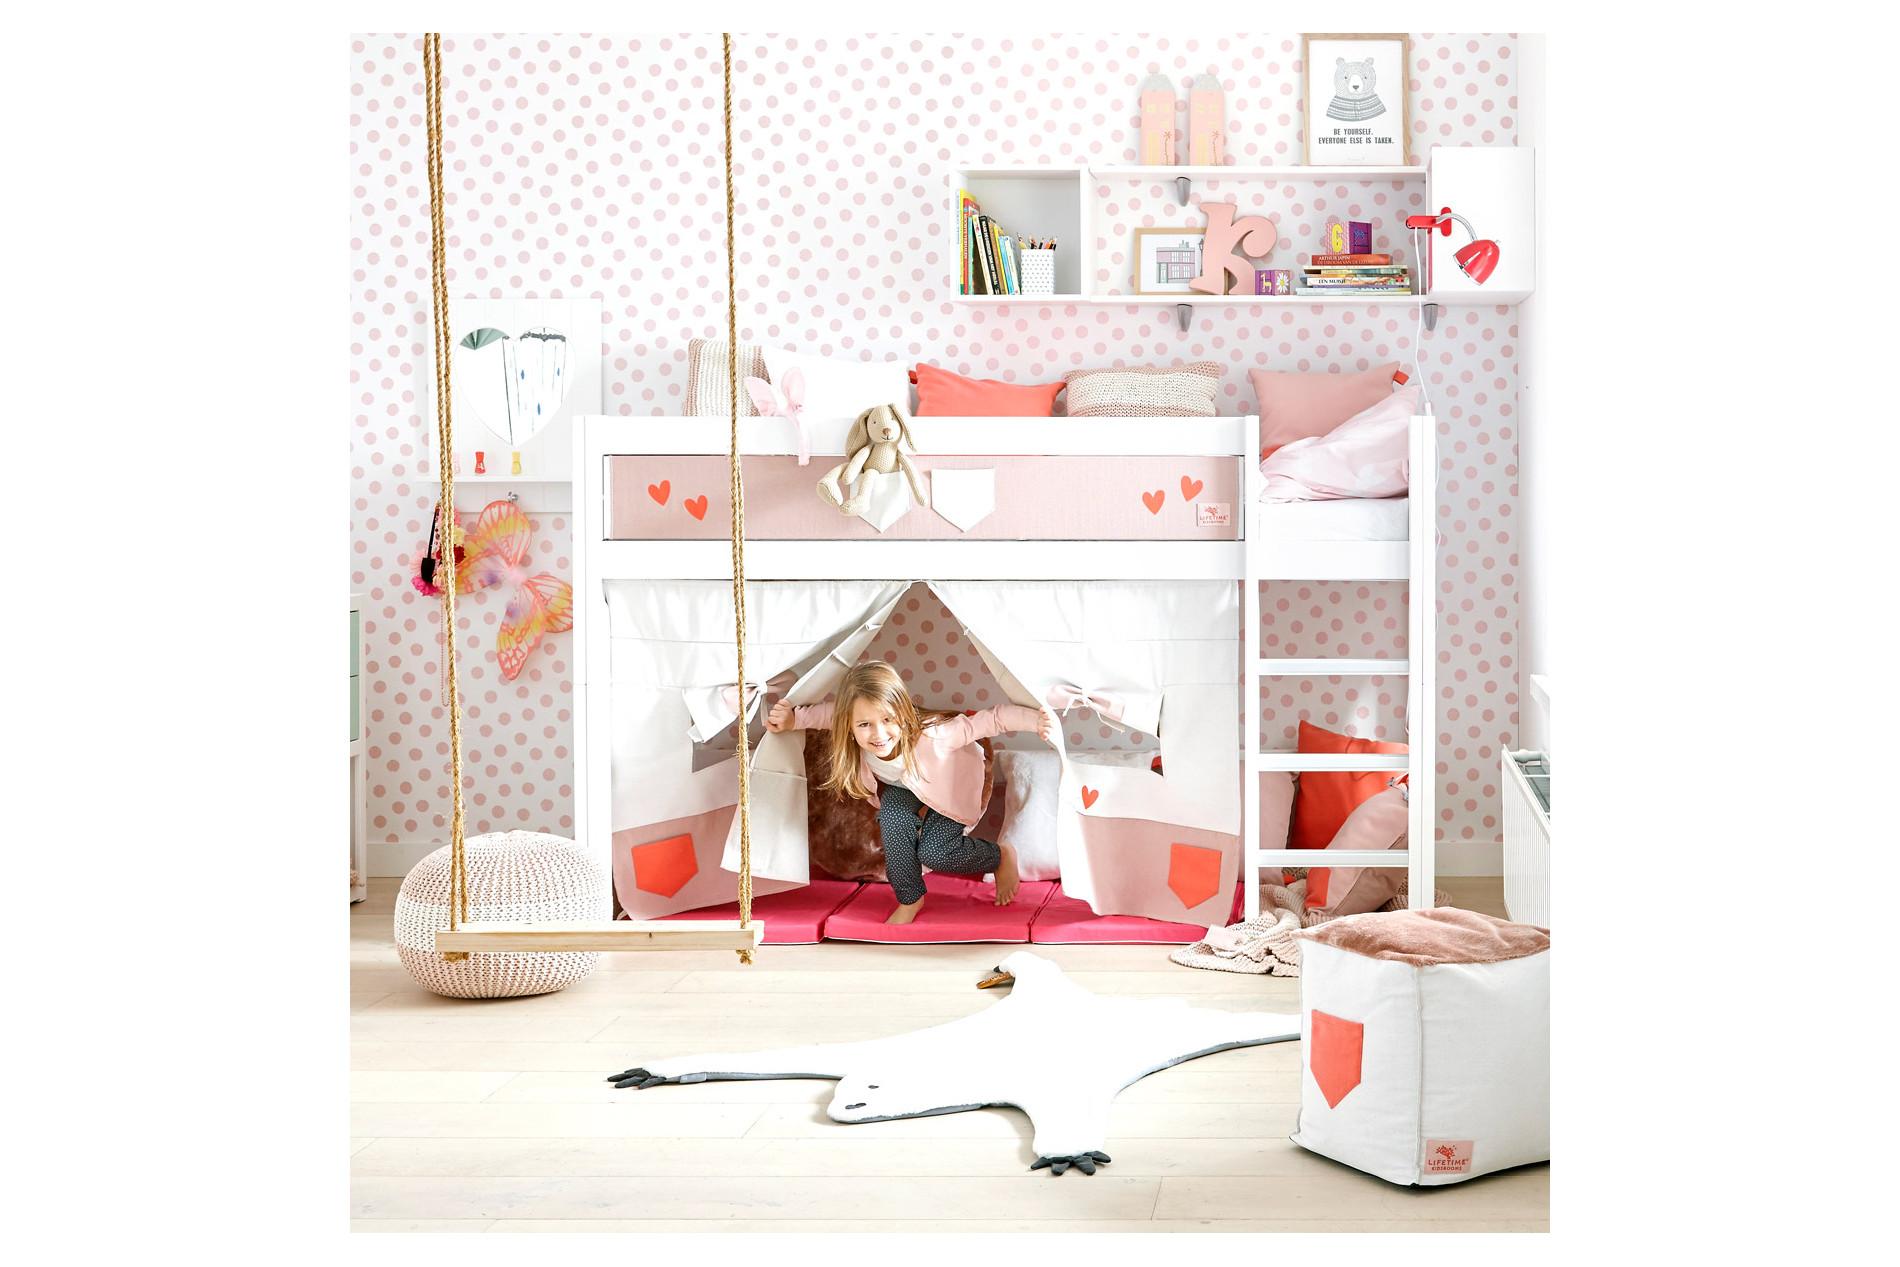 Full Size of Lifetime Bett Kinderzimmer Sugar Pie Weiss Günstige Betten 140x200 Modern Design Ikea 160x200 Eiche Sonoma Rausfallschutz Boxspring Hohes Kopfteil Günstig Bett Lifetime Bett